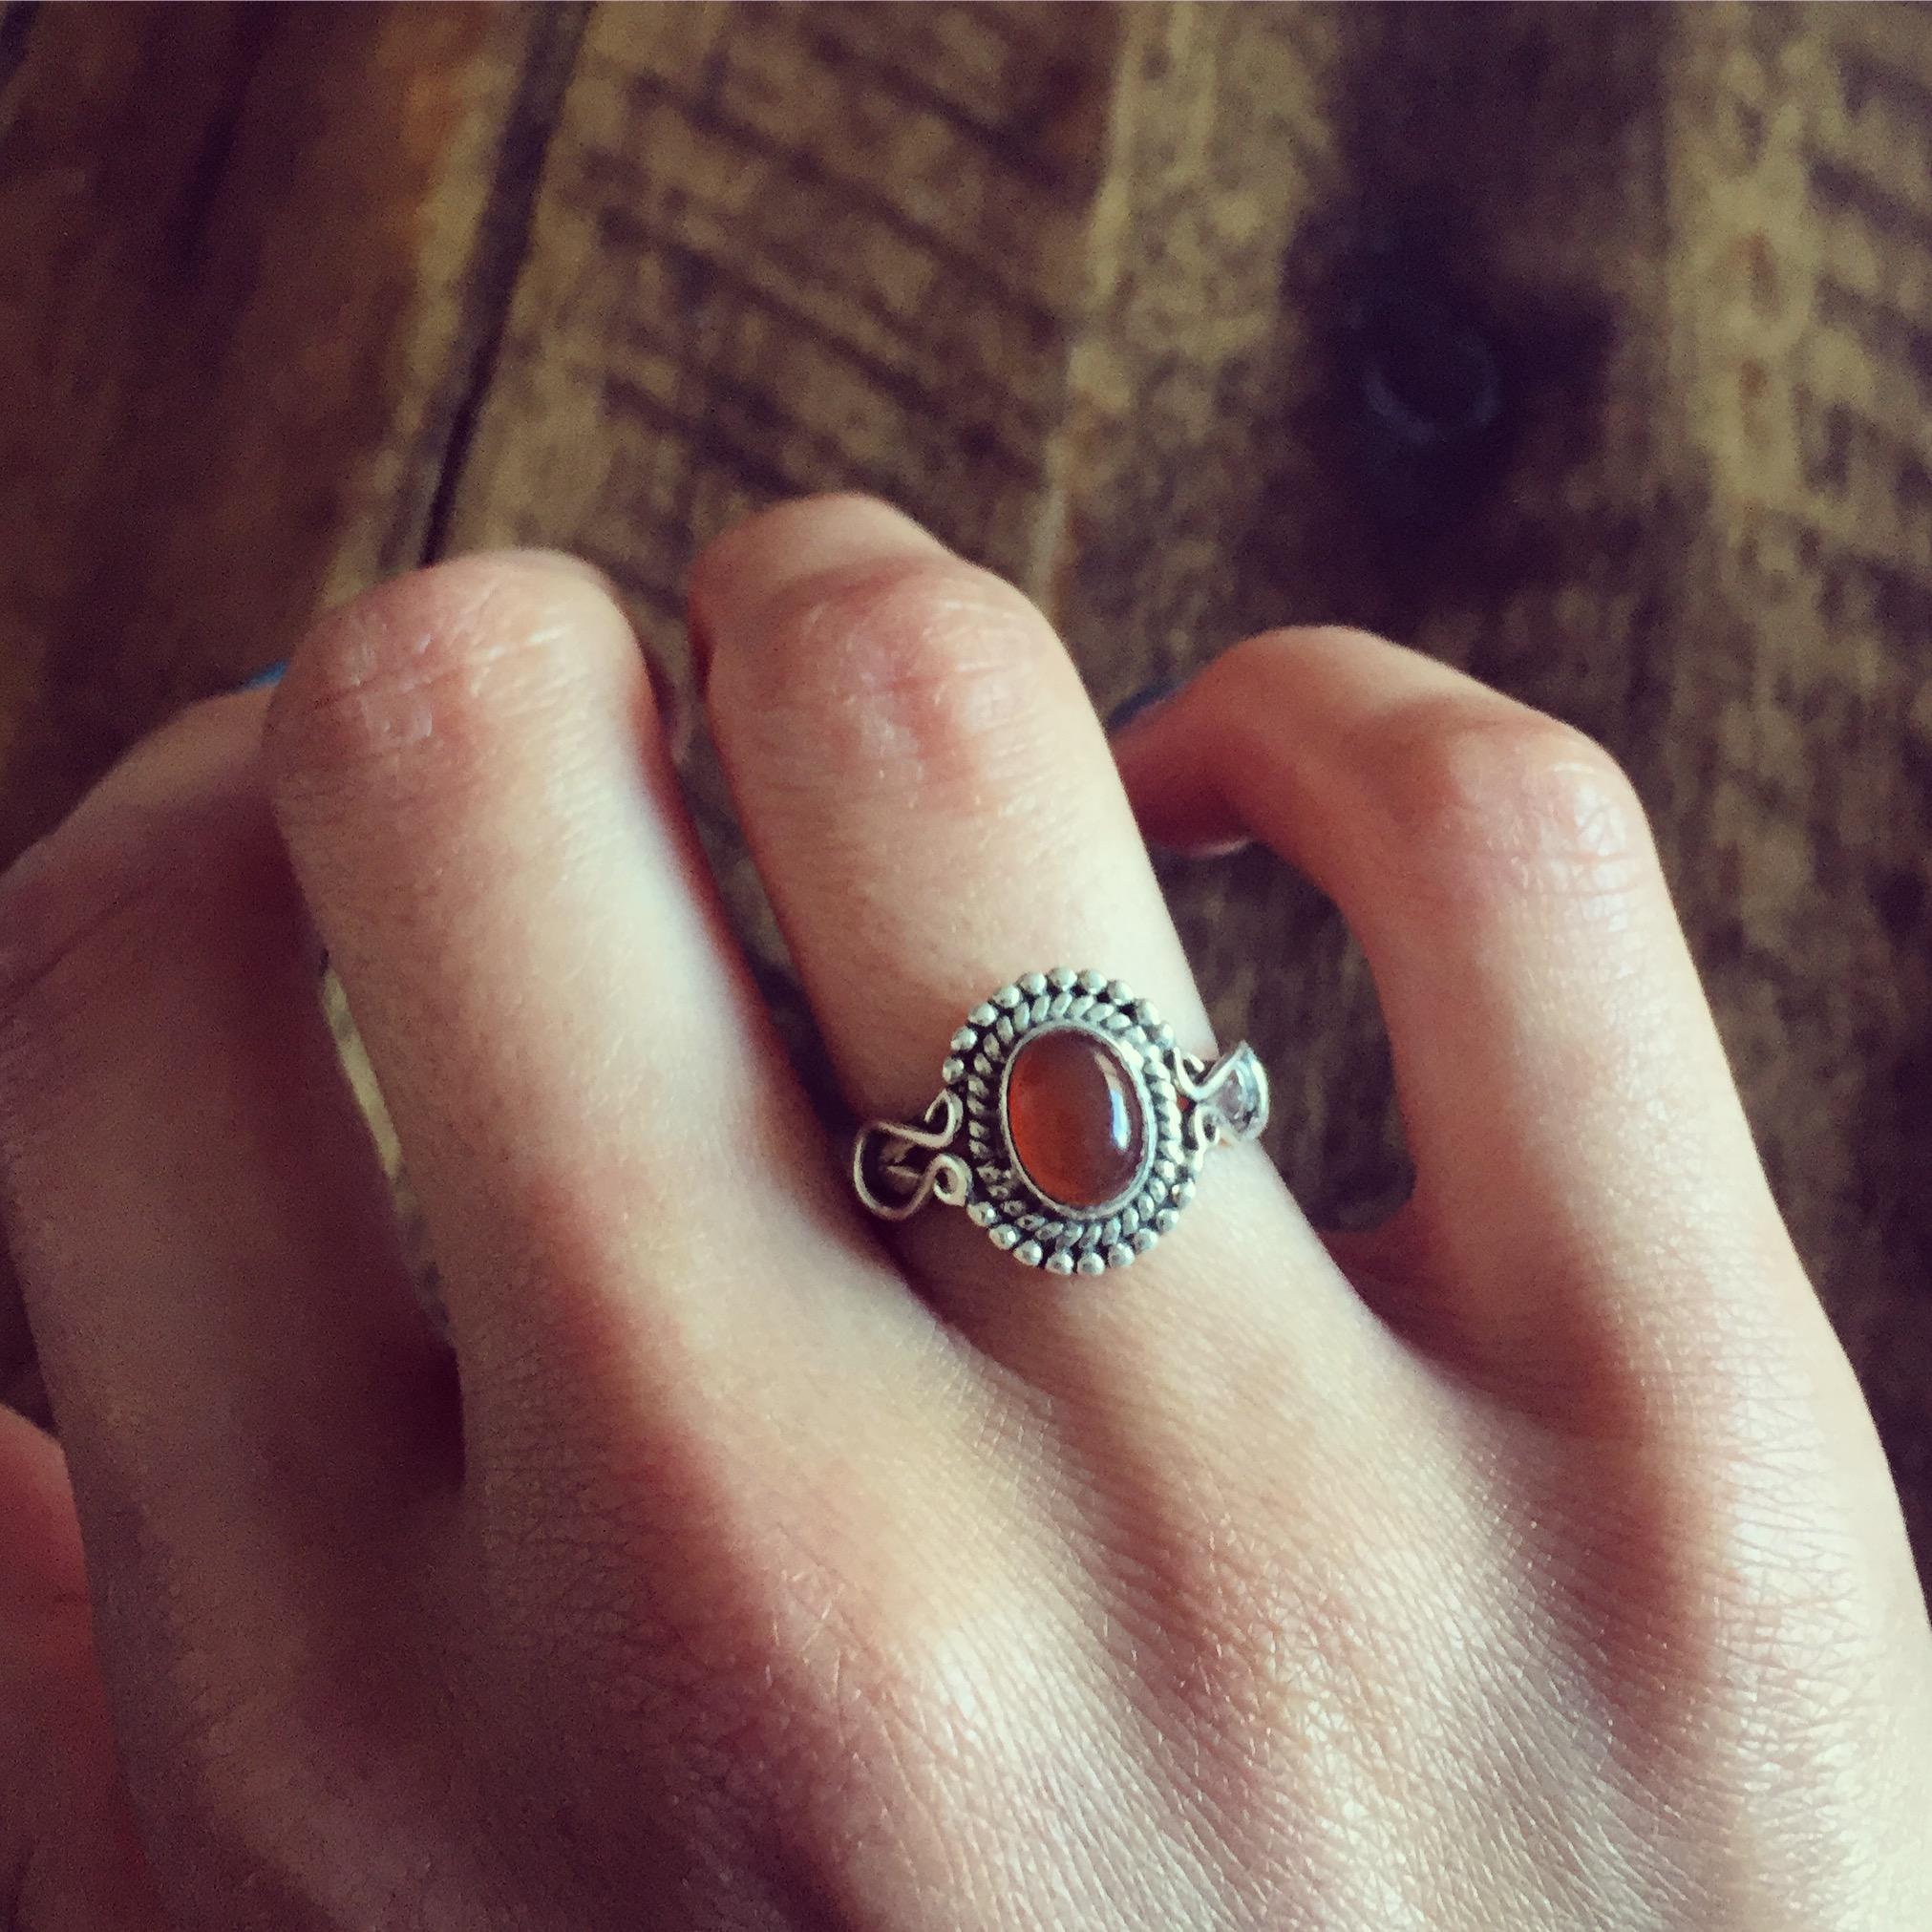 Carlenian 925 Sterling Silver Ring